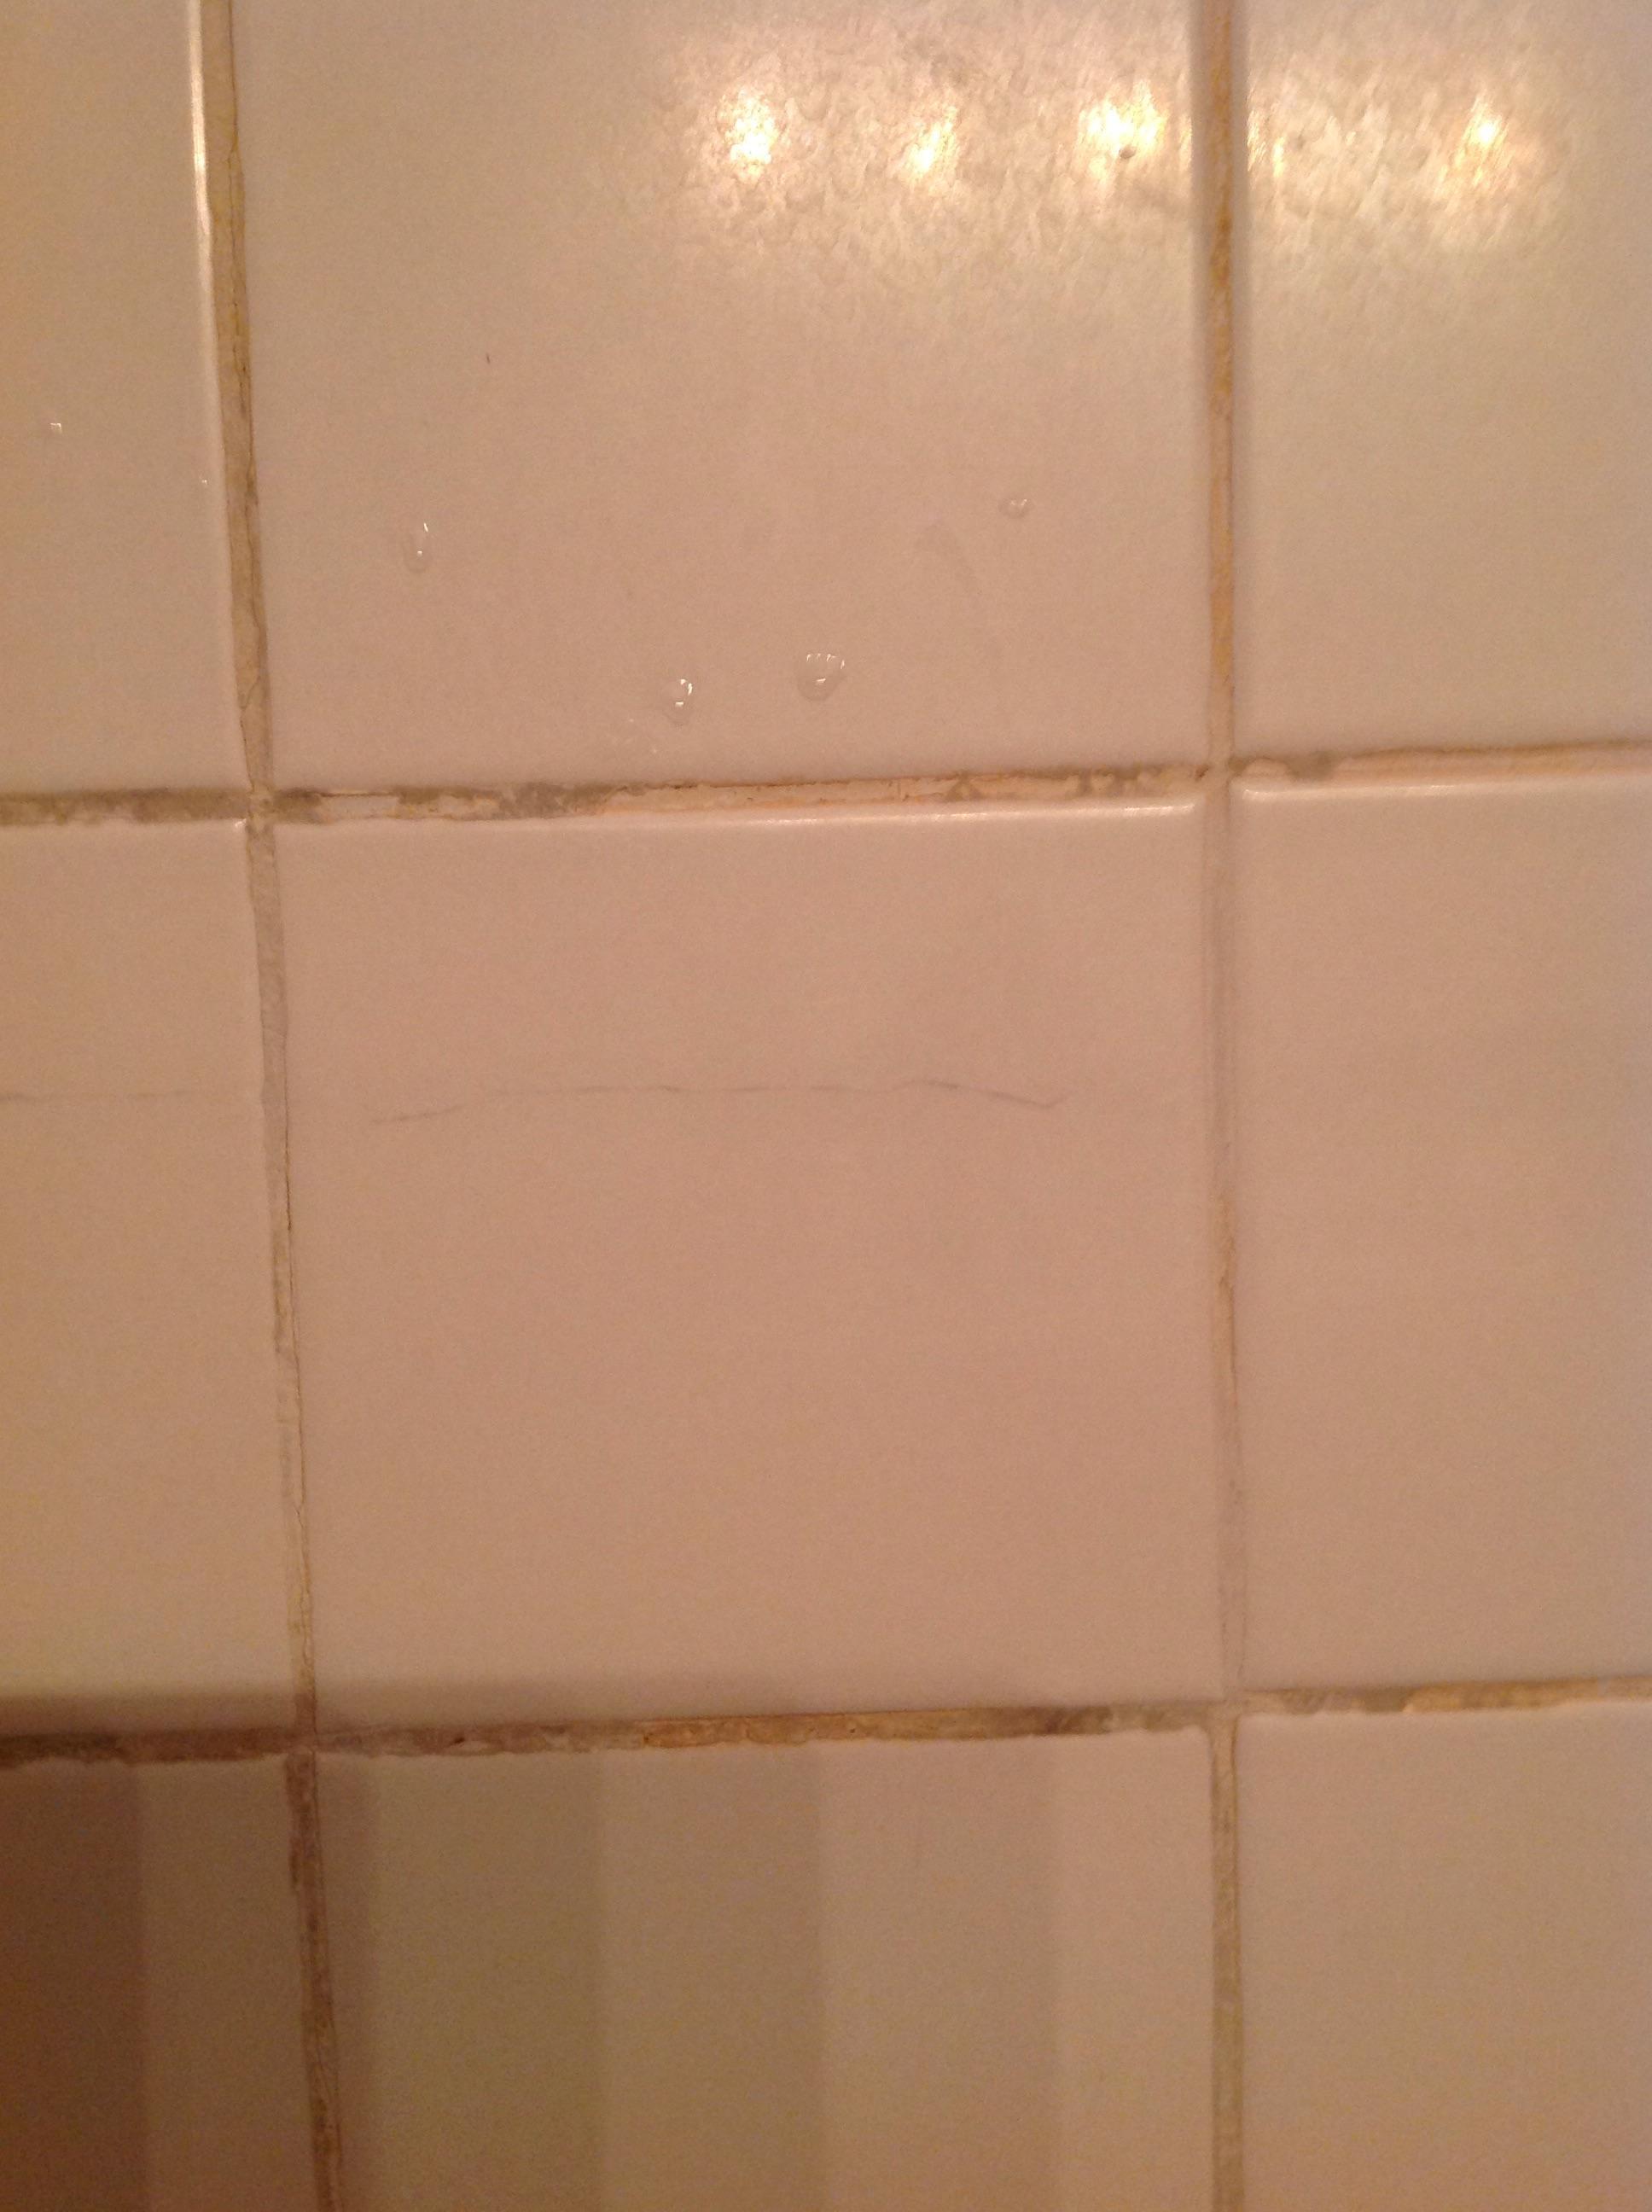 Repair Cracked Bathroom Tile Runs Almost Entire Length